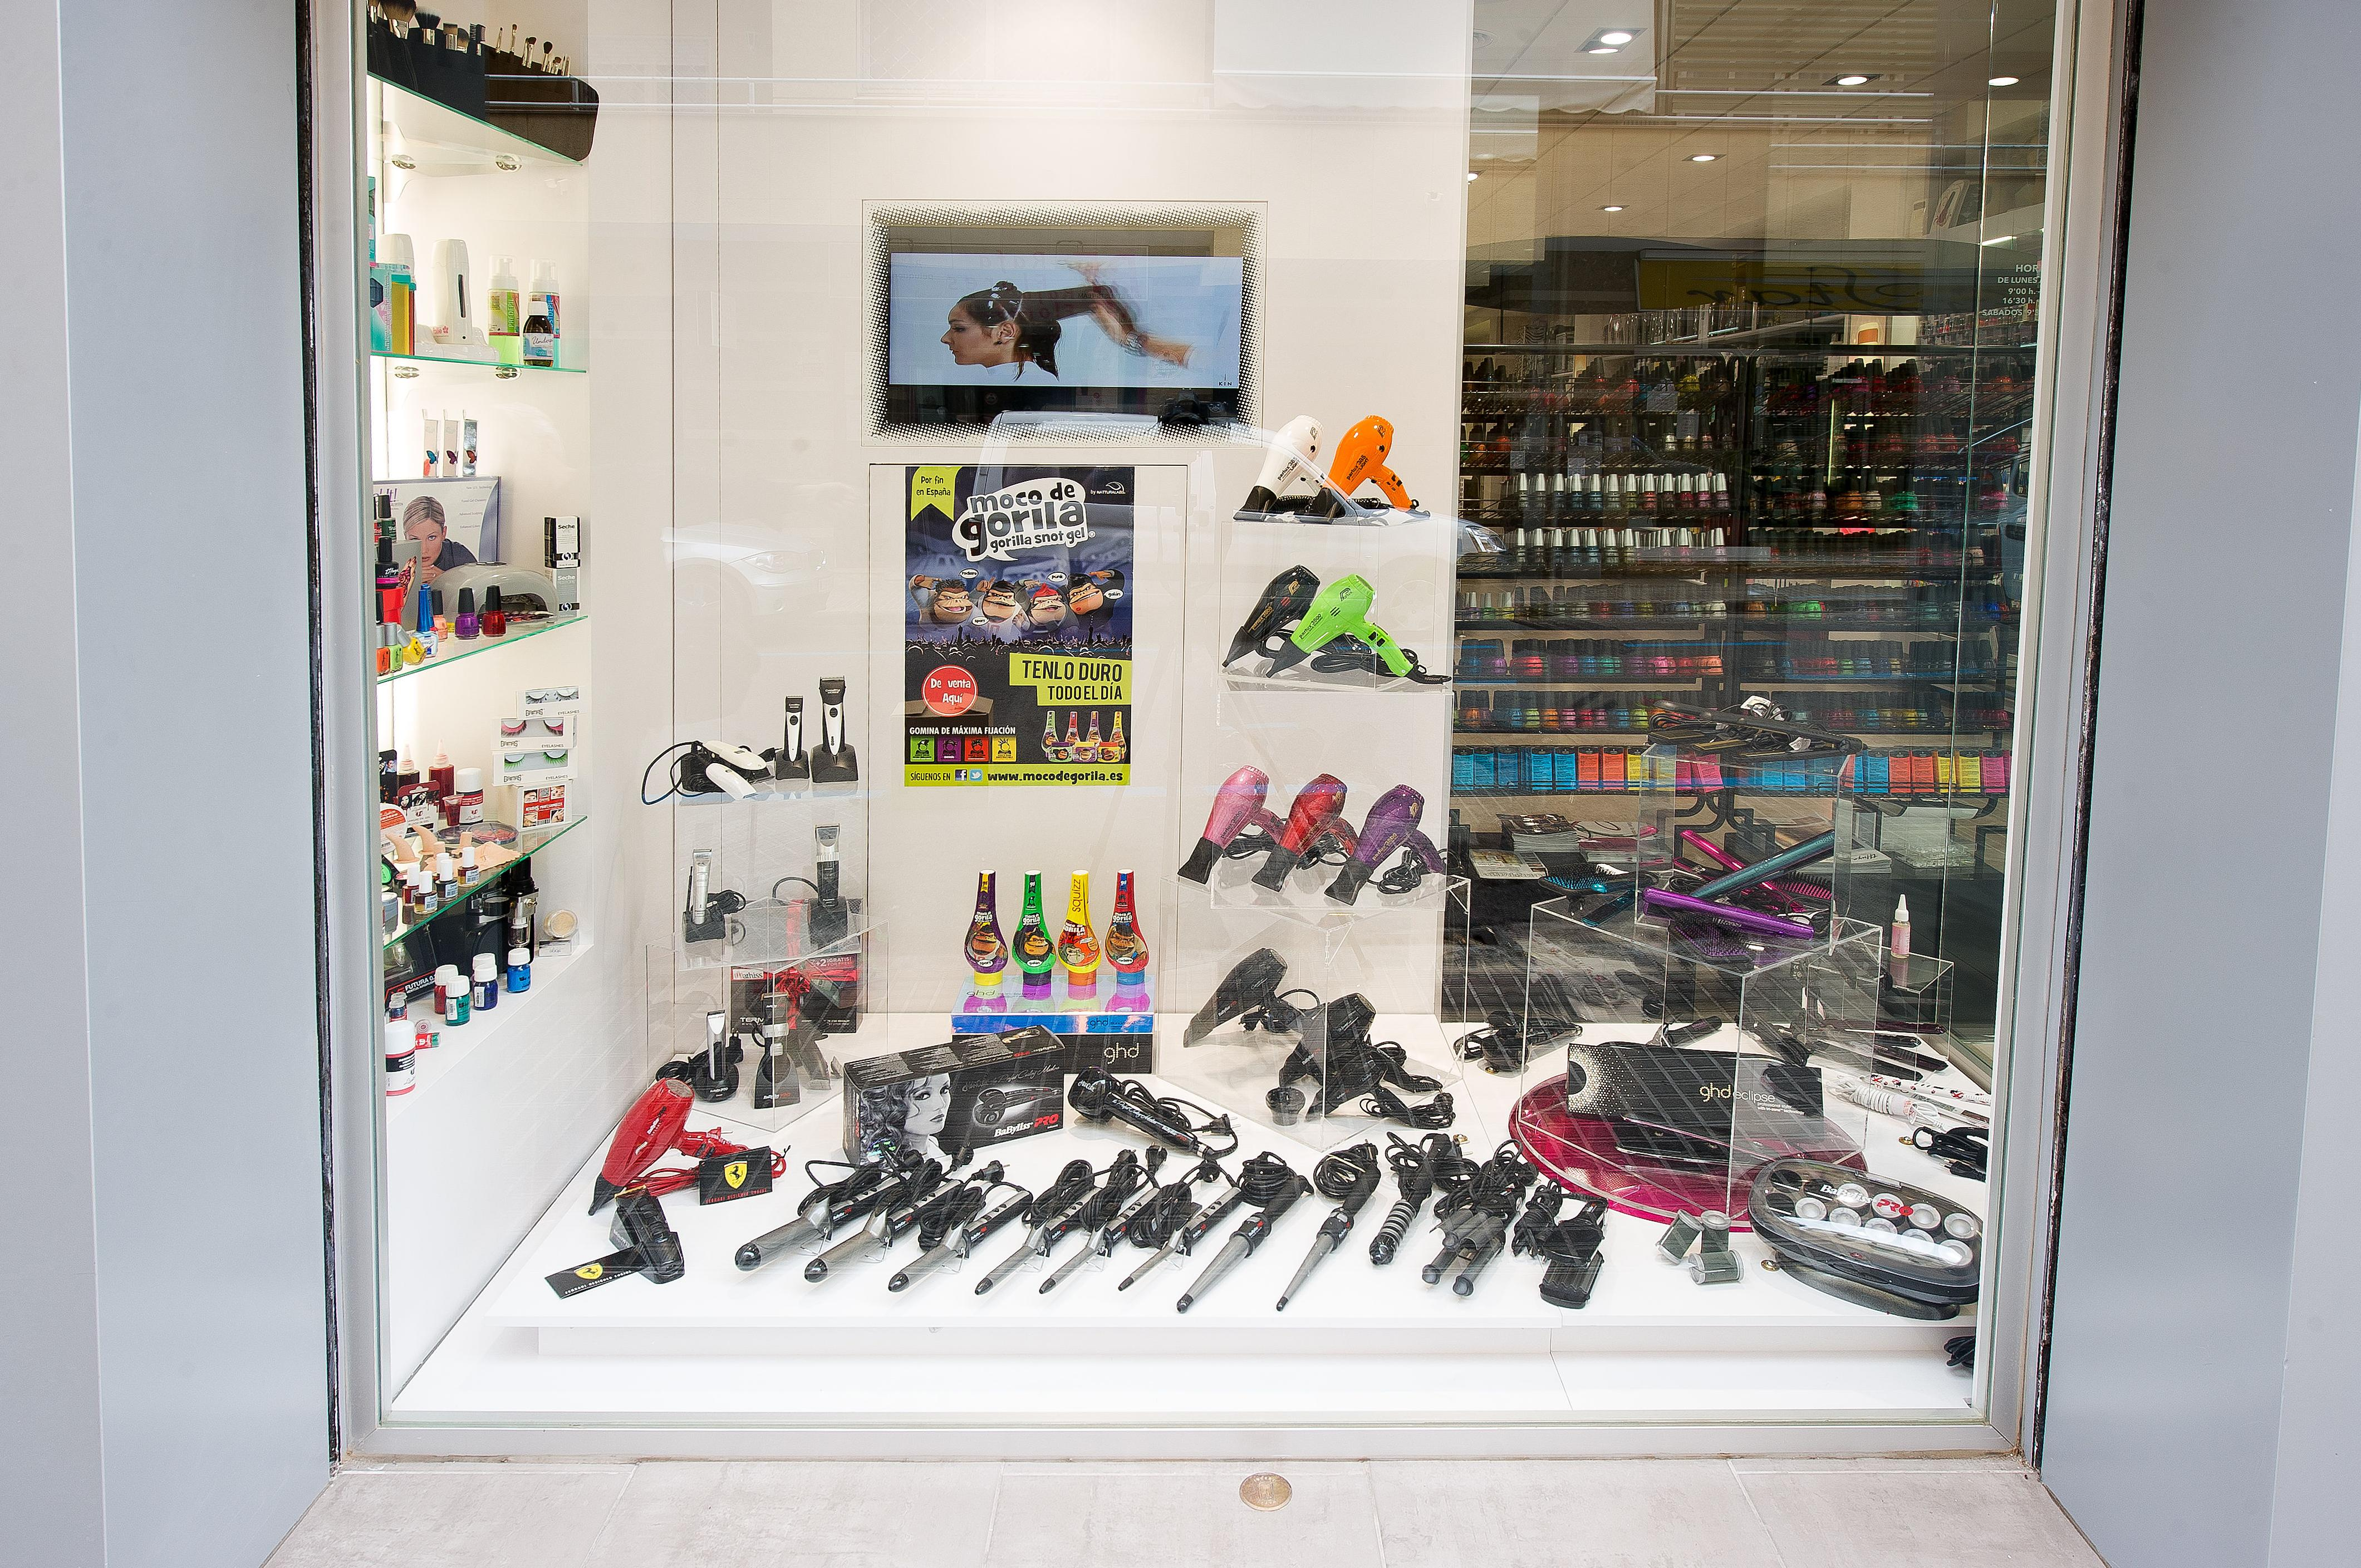 Foto 12 de Suministros para peluquerías y estética  en Ibiza | Mathiss